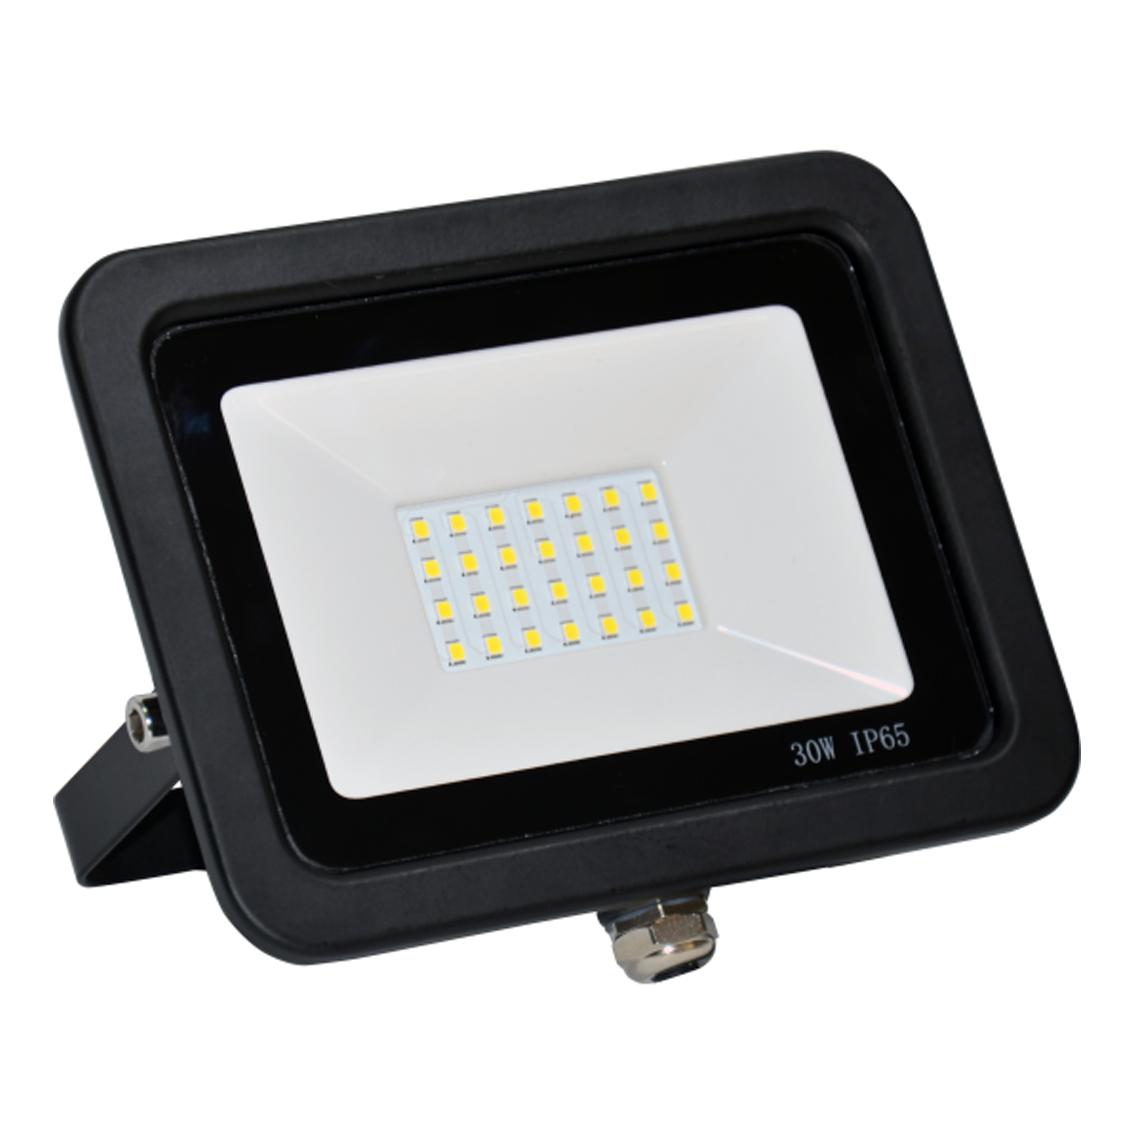 SMD LED reflektor 30W 3000K 2400lm Crni Mitea Elektro Vukojevic